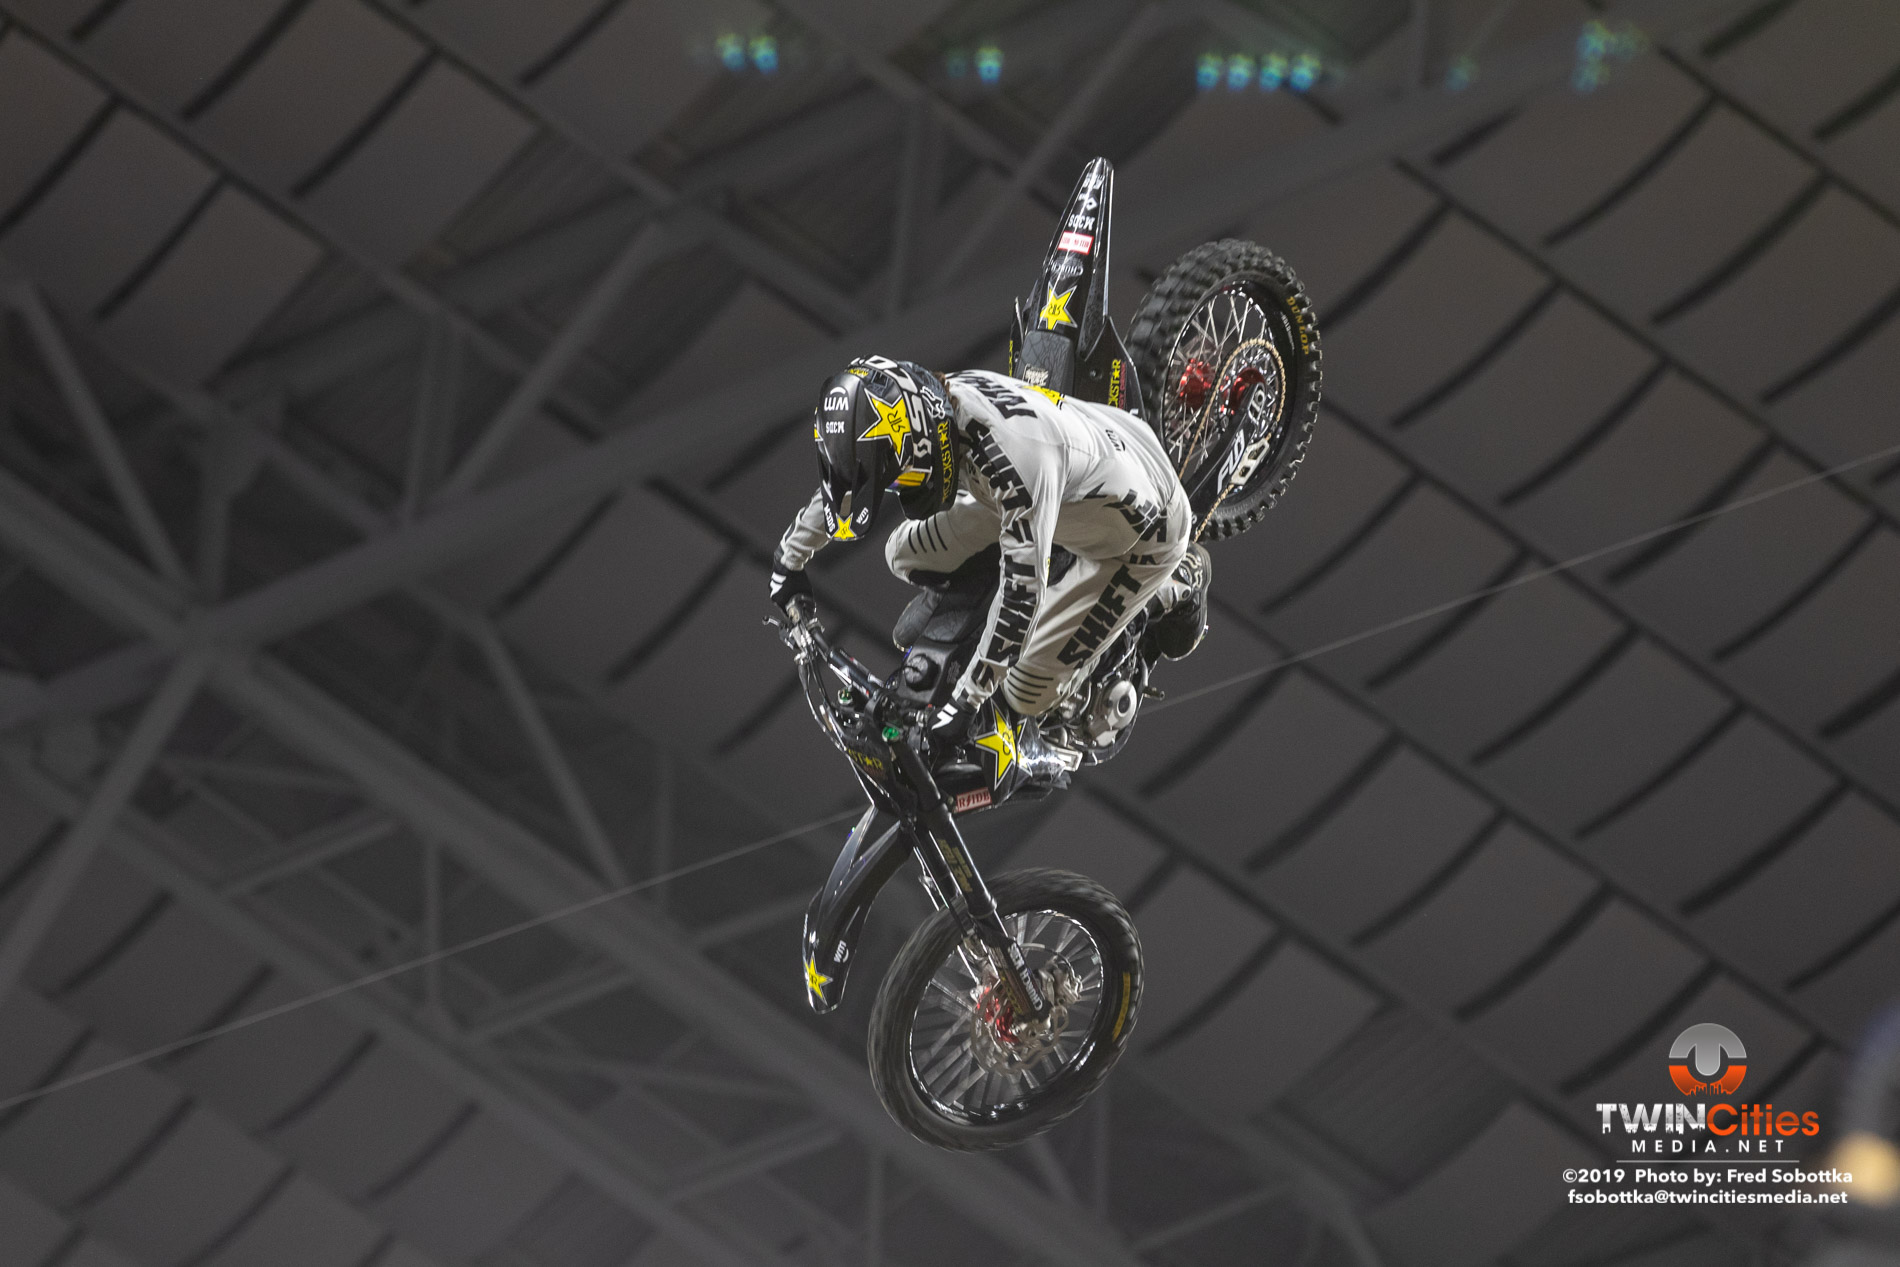 Moto-X-Quarterpipe-High-Air-01